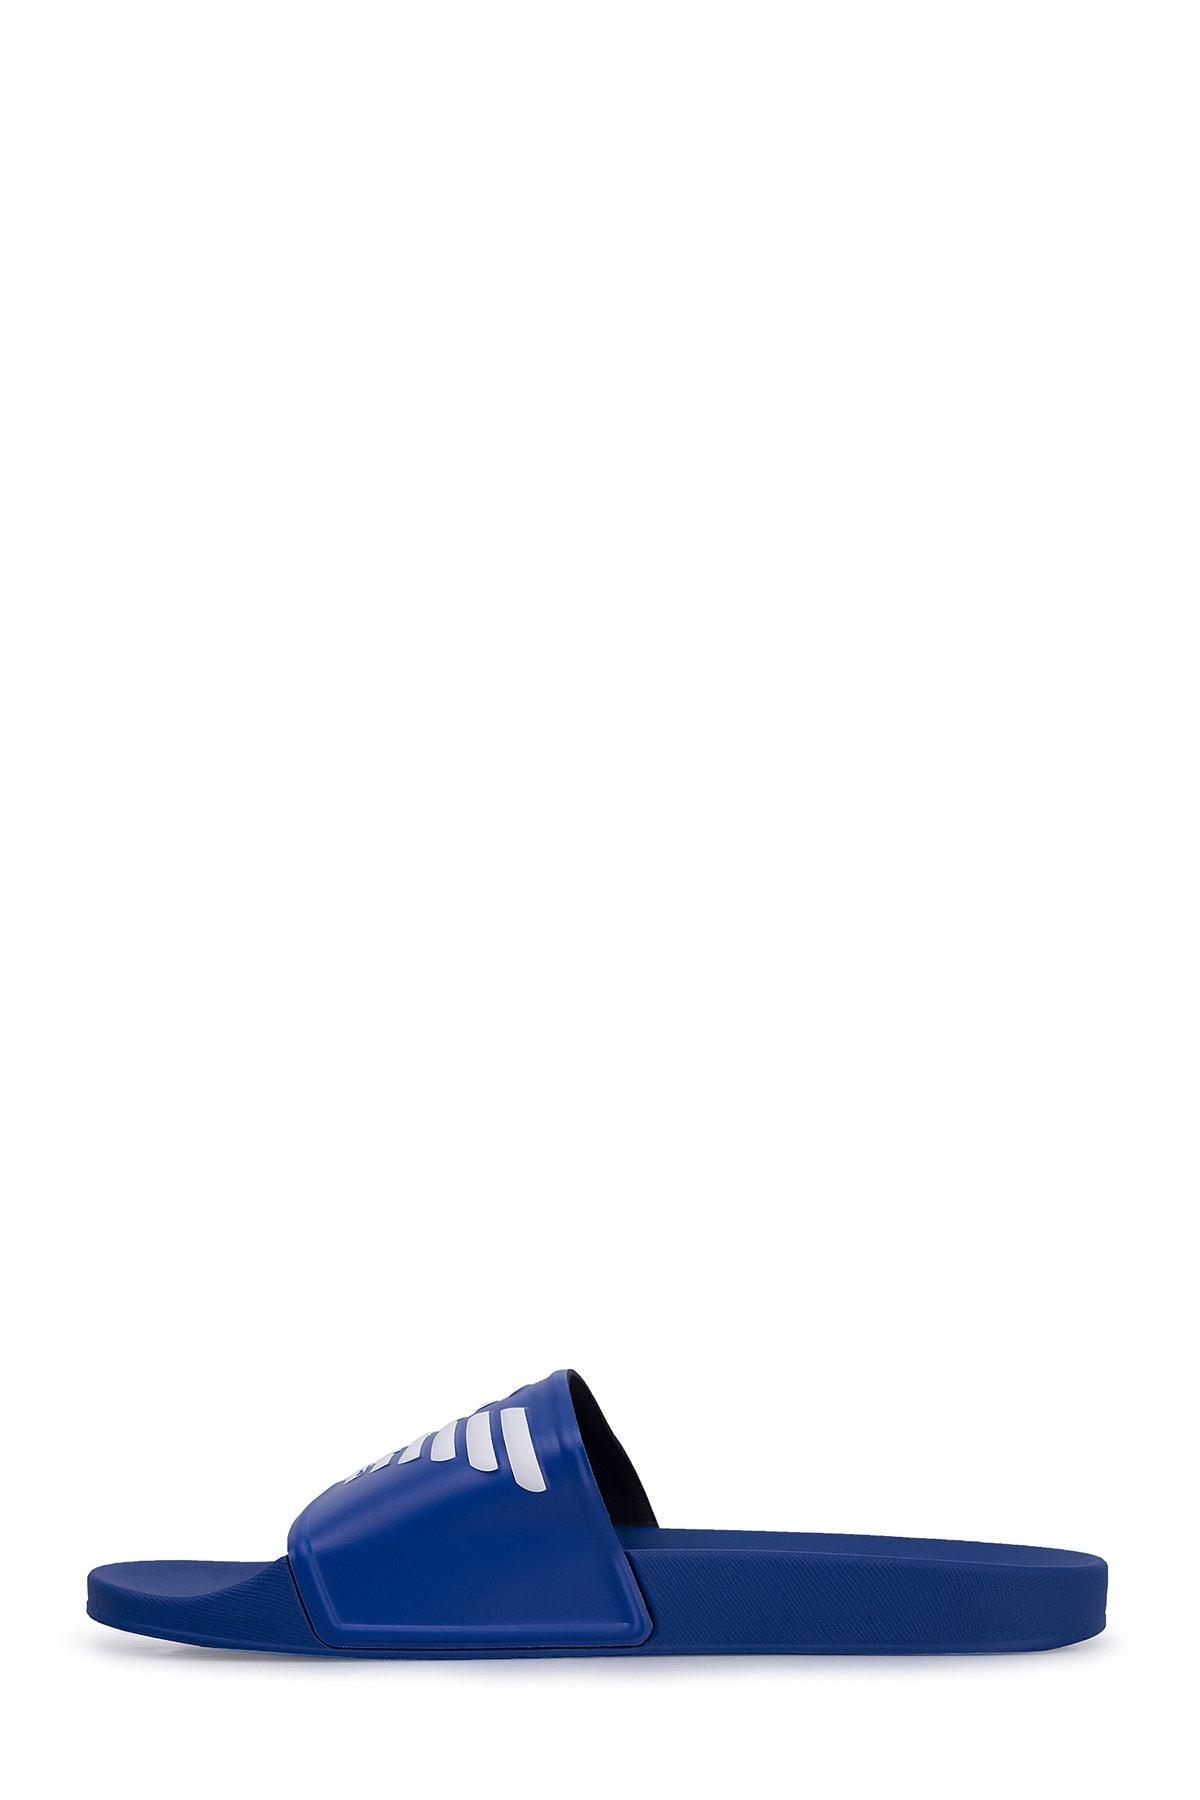 Emporio Armani Erkek Lacivert Terlik X4ps01 Xl828 M592 2